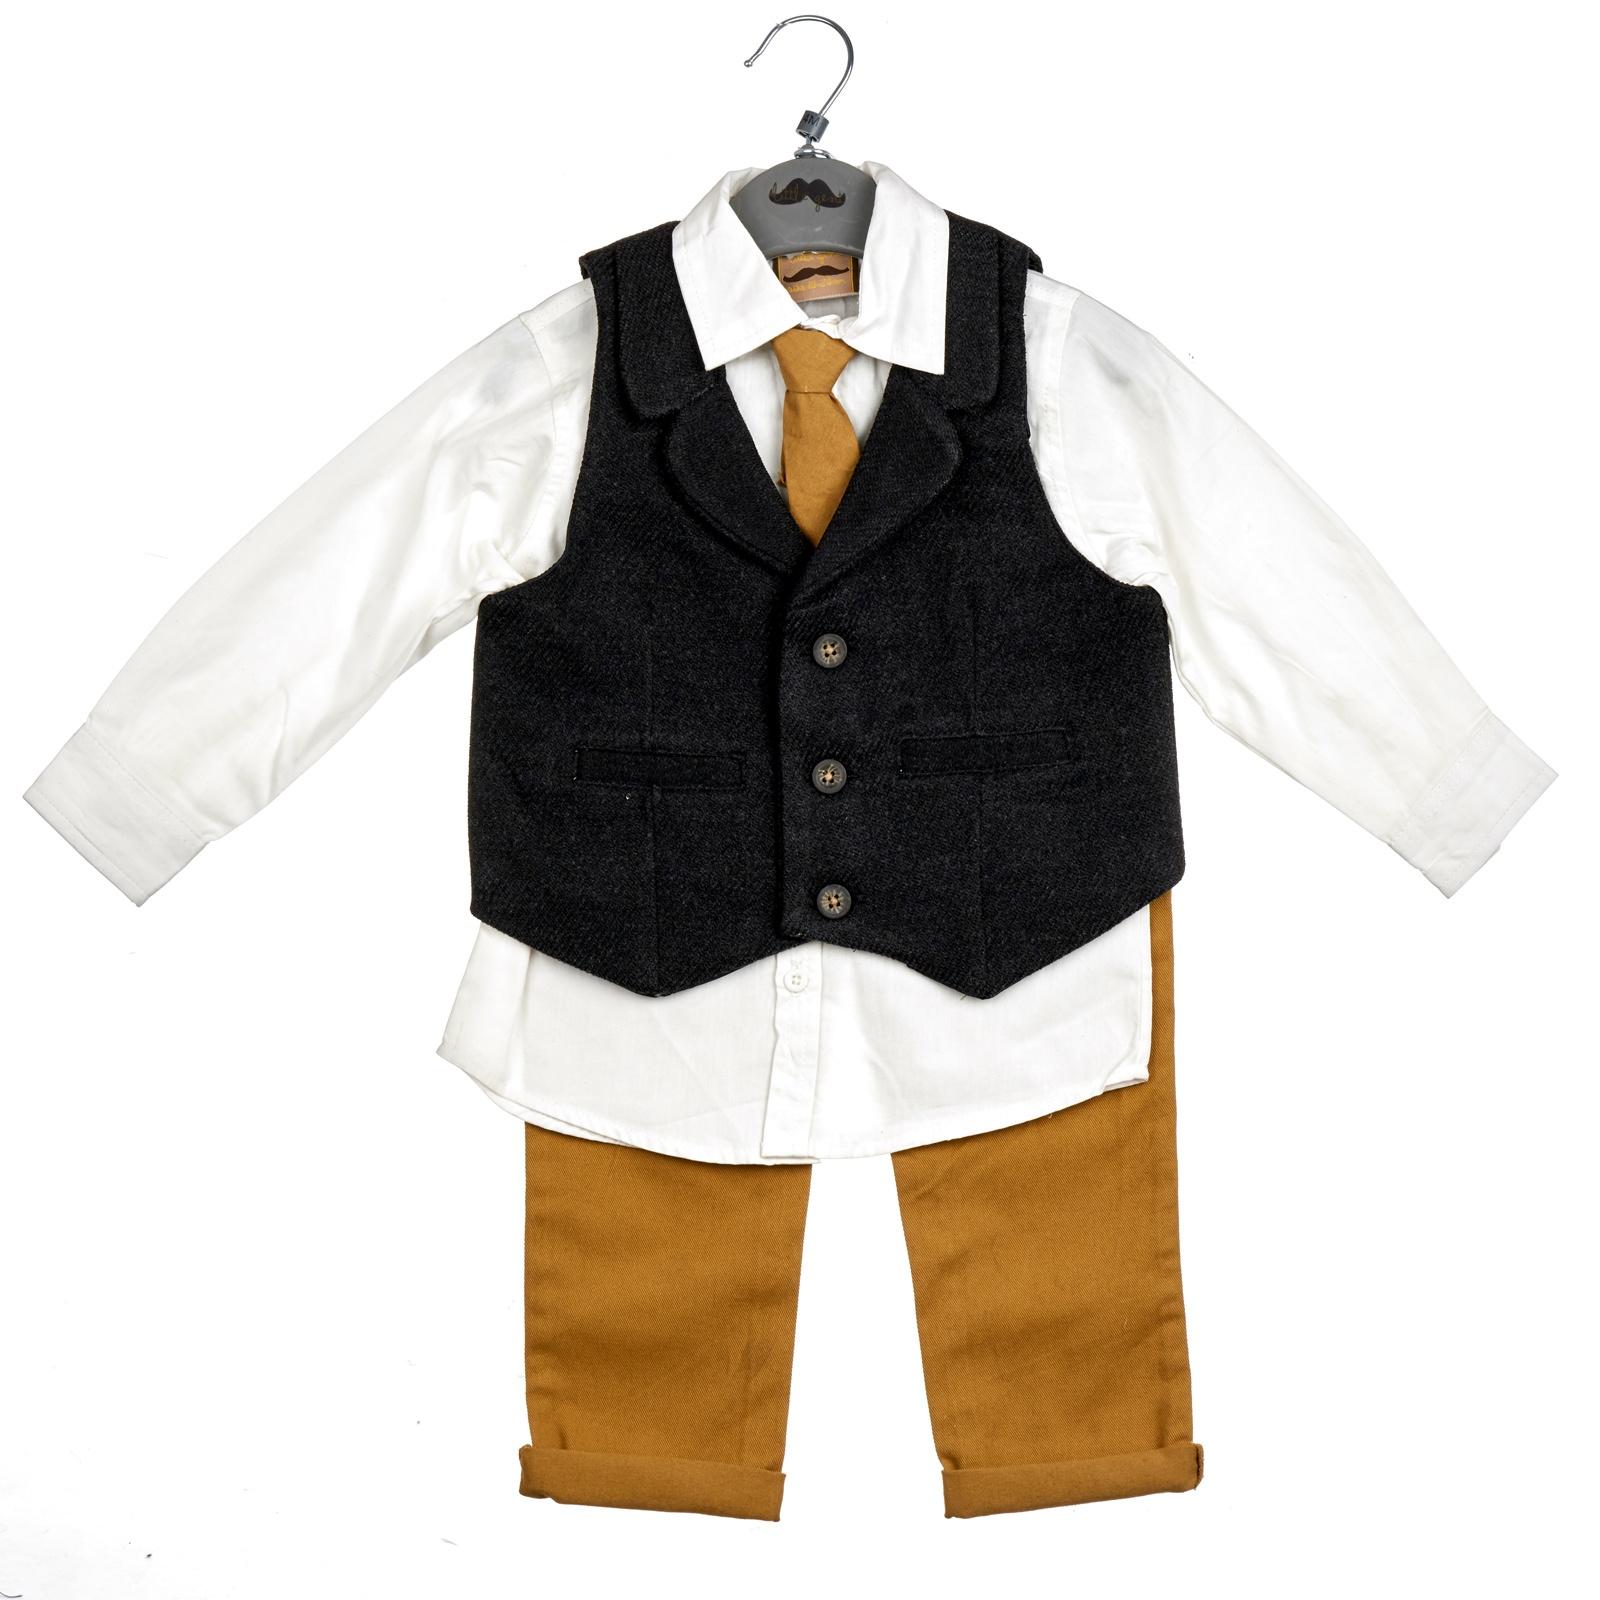 36df7a77b Boys Tweed Waistcoat outfit 2-5yrs – 4 Direct Uniforms